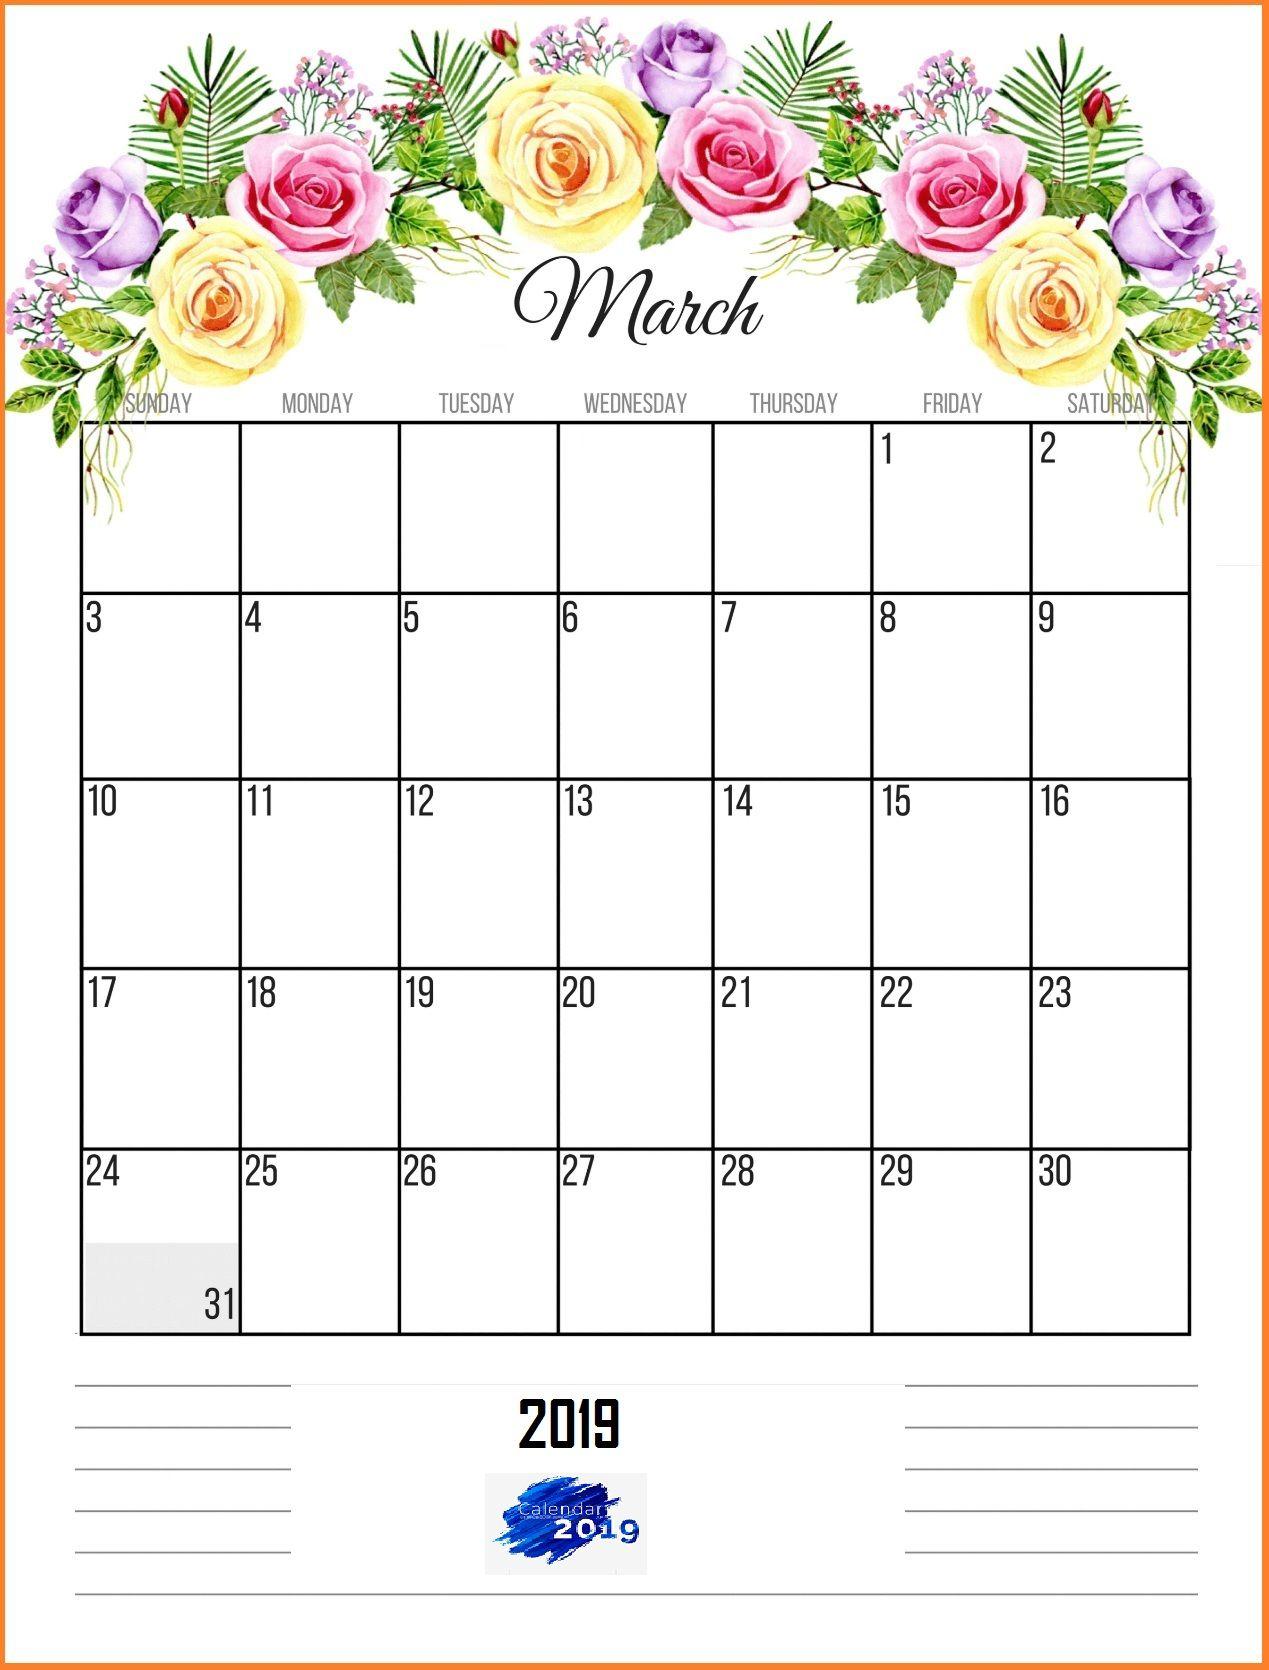 Floral March 2019 Wall Calendar